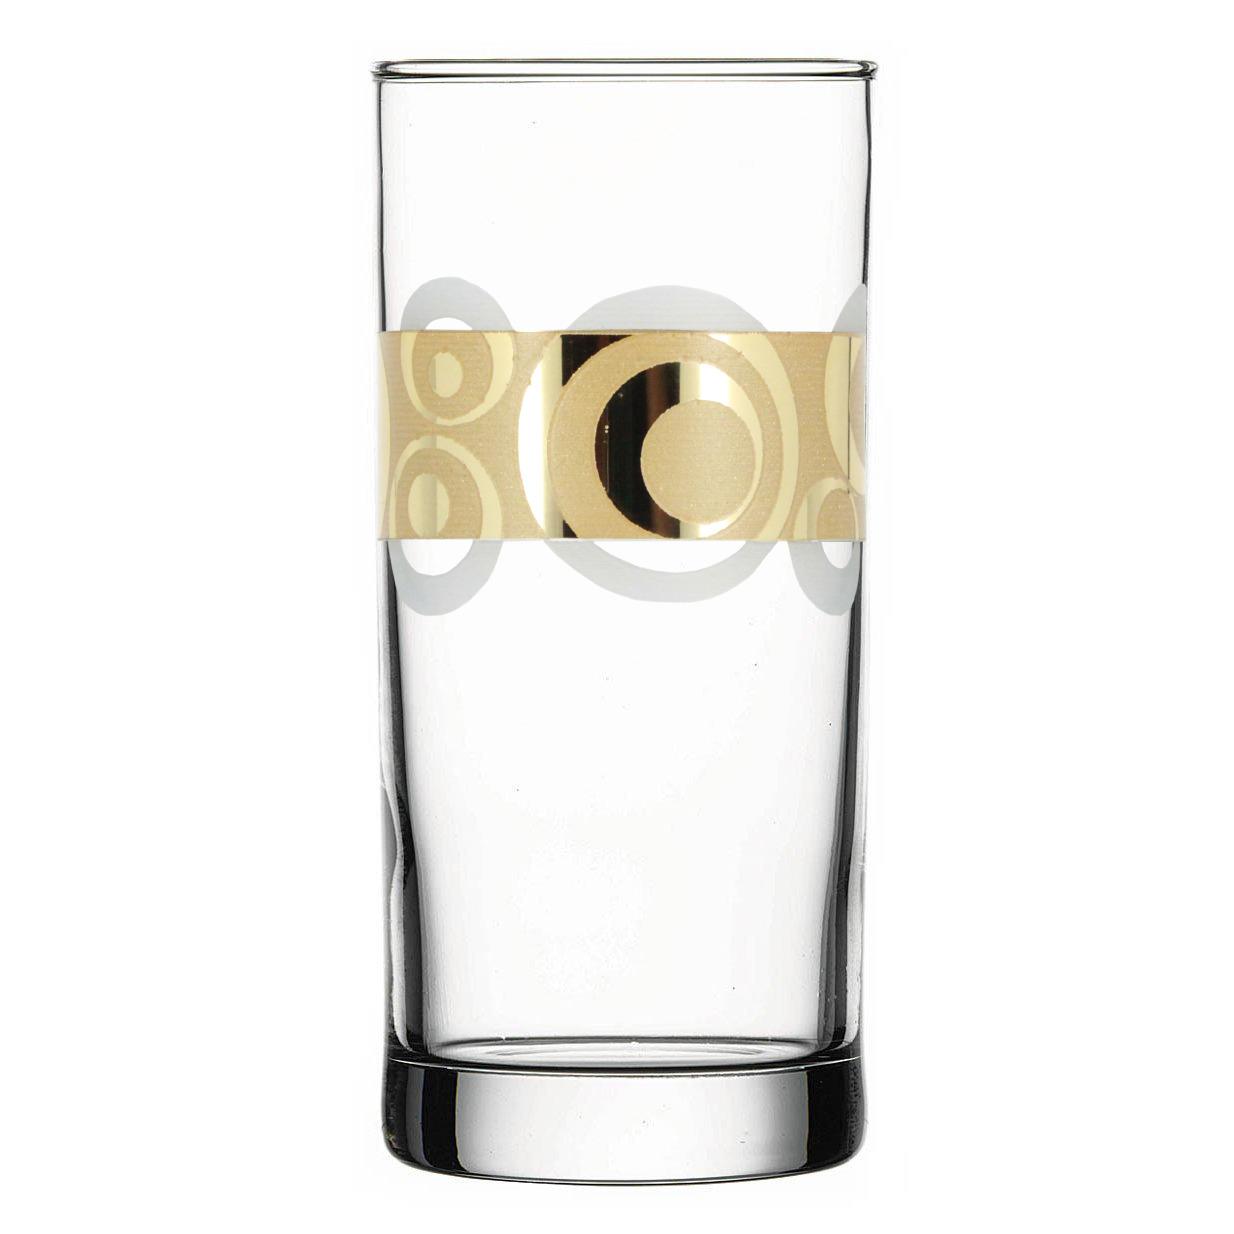 Набор стаканов Гусь-Хрустальный Сияние, EAV27-402, 290 мл, 6 шт набор стаканов гусь хрустальный веточка 350 мл 6 шт